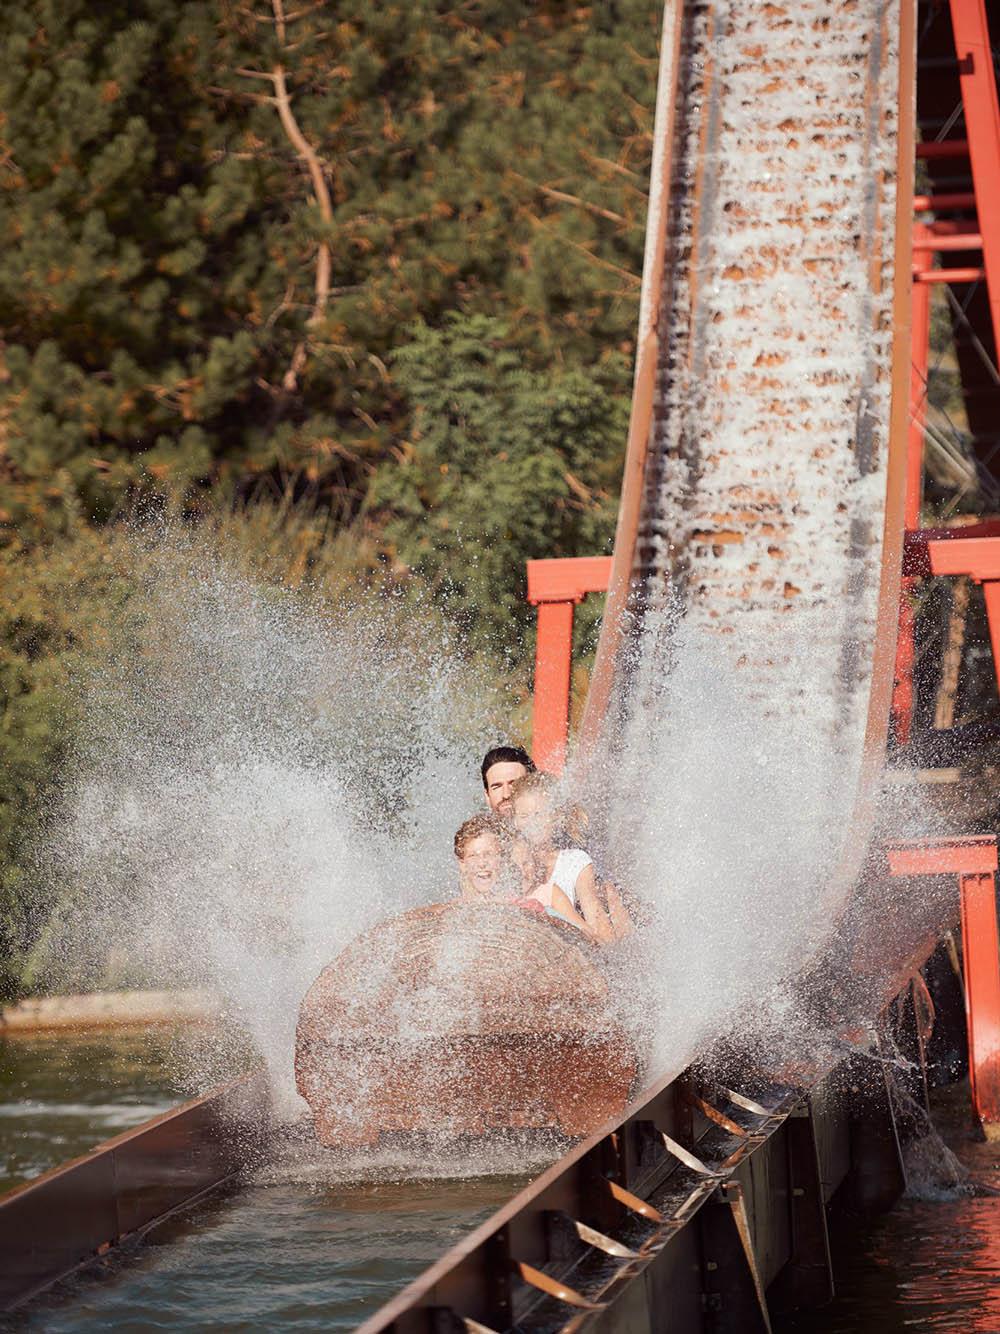 Interlink New Ride : Log Flume Drakkar at Walygator Sud-Ouest 2